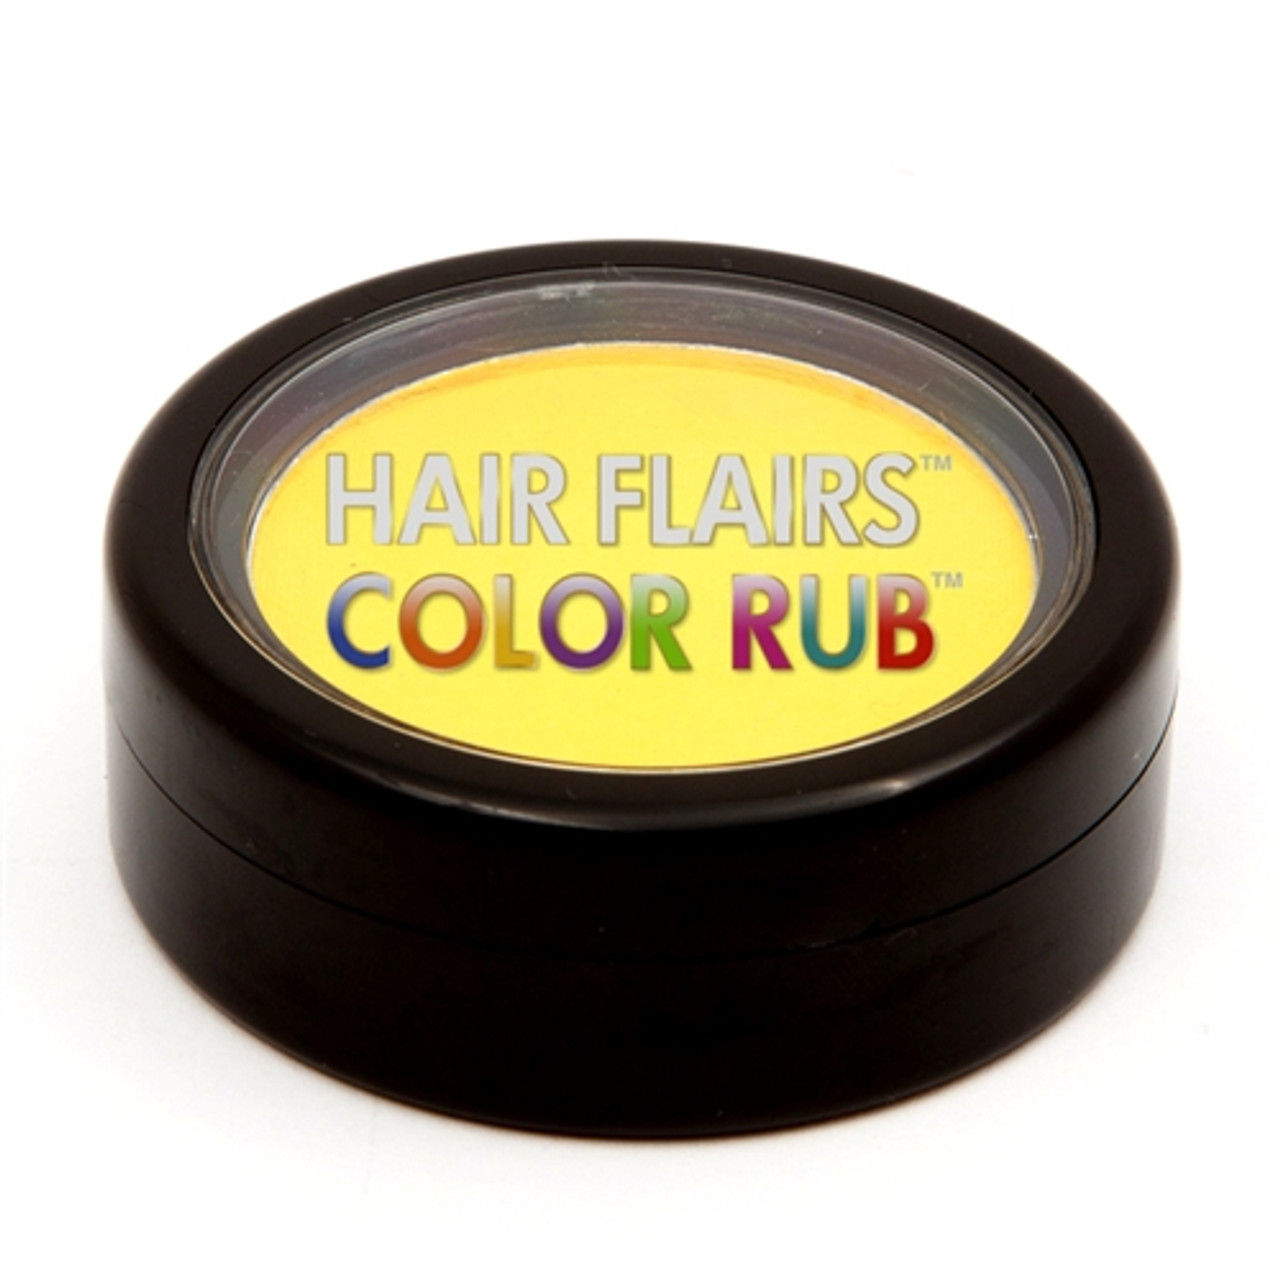 Hair Flair Color Rub - Yellow Spark